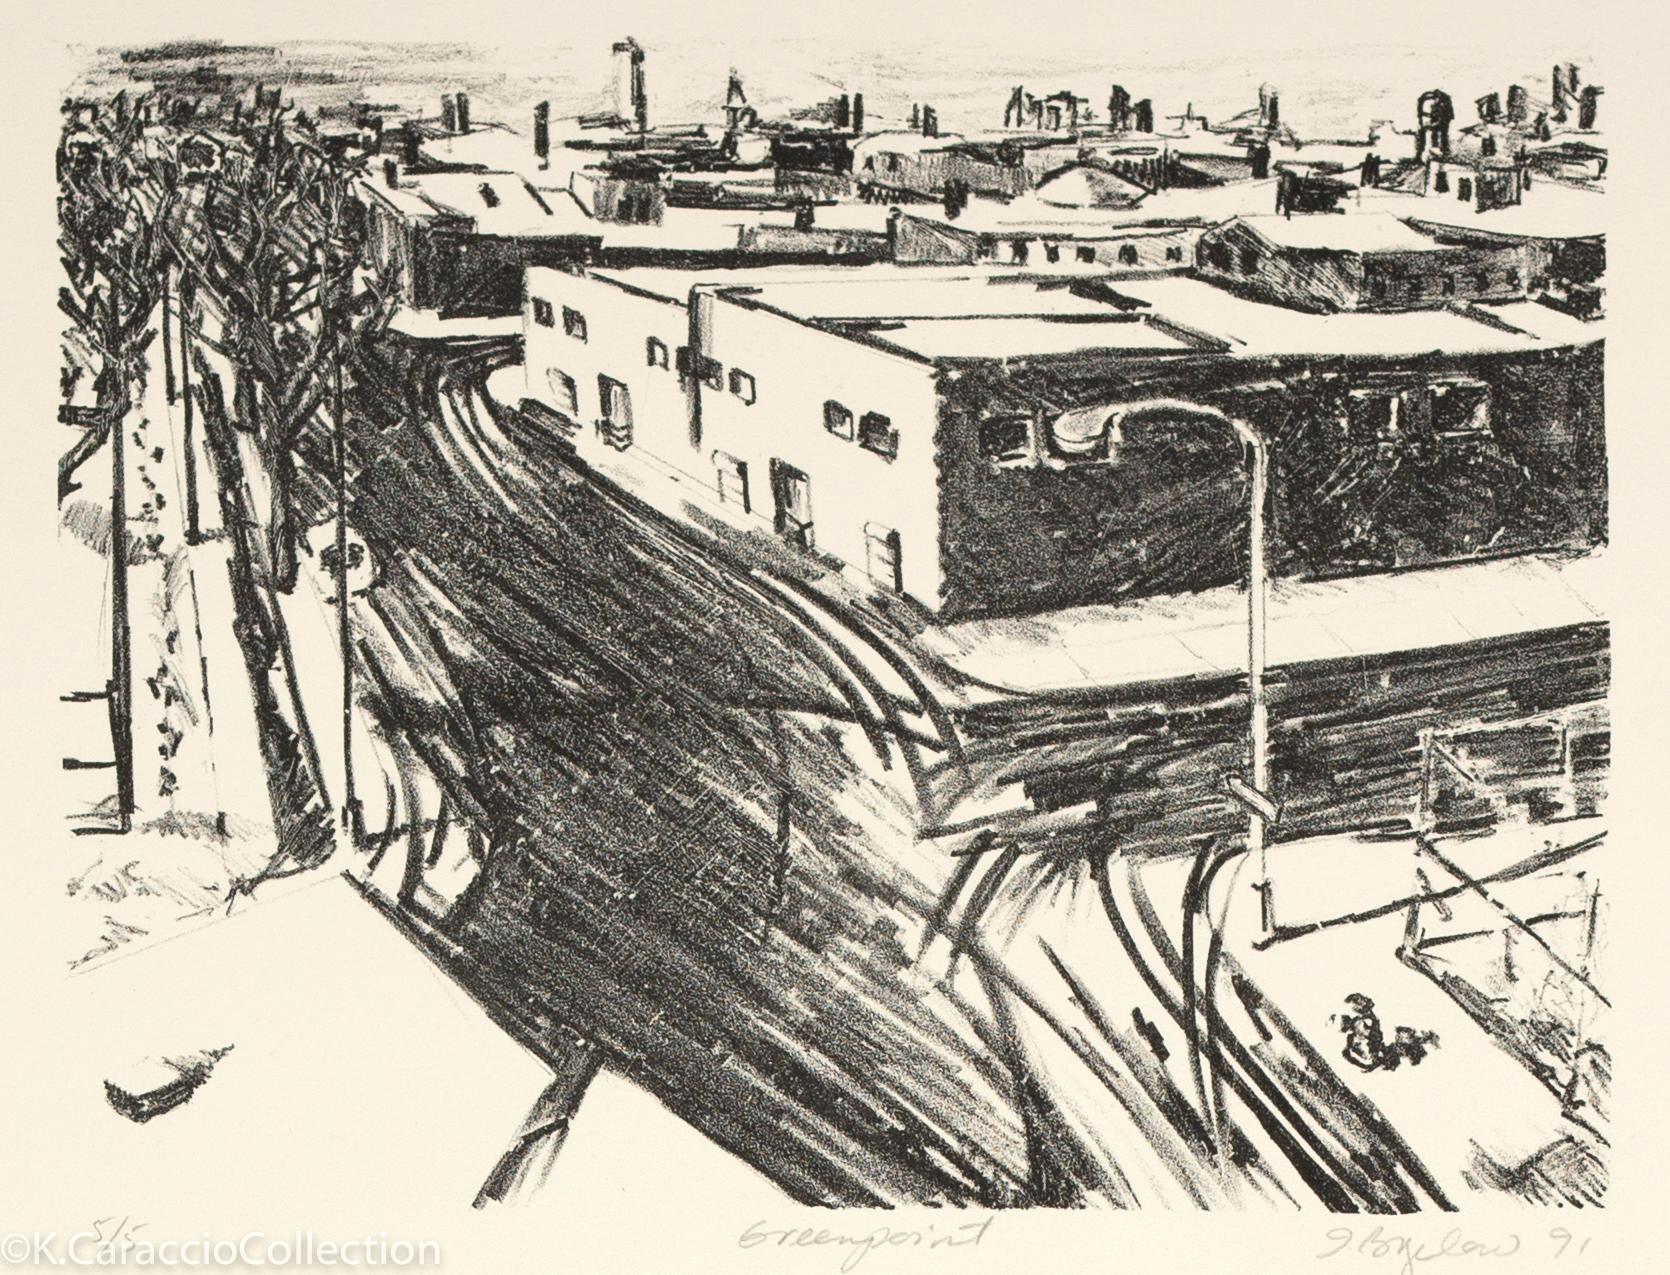 GREENPOINT, 1991